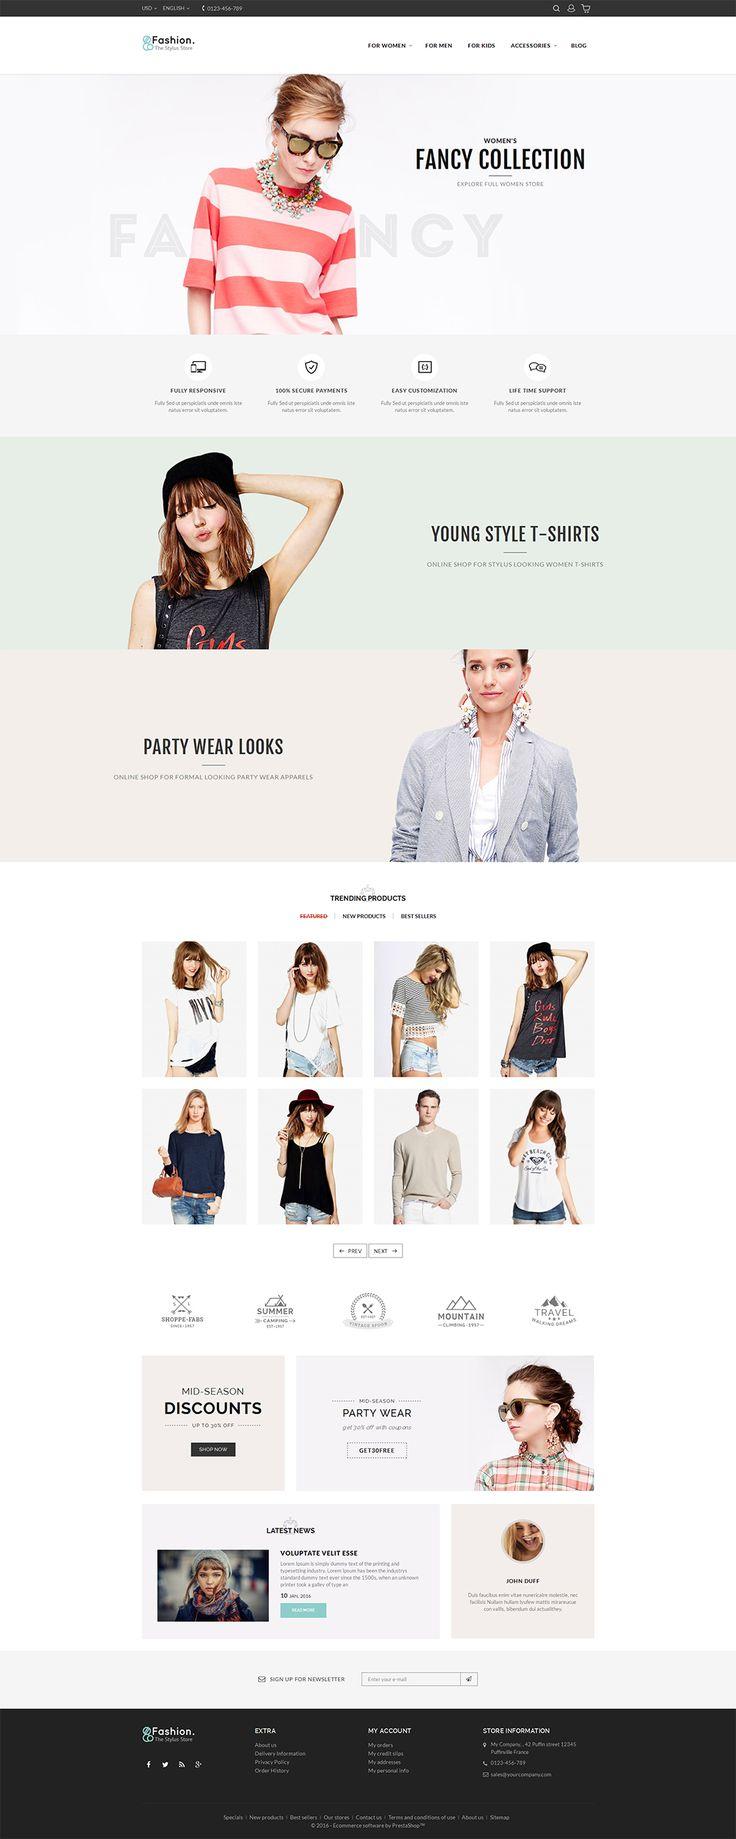 Best 25+ Fashion web design ideas on Pinterest | Fashion websites ...